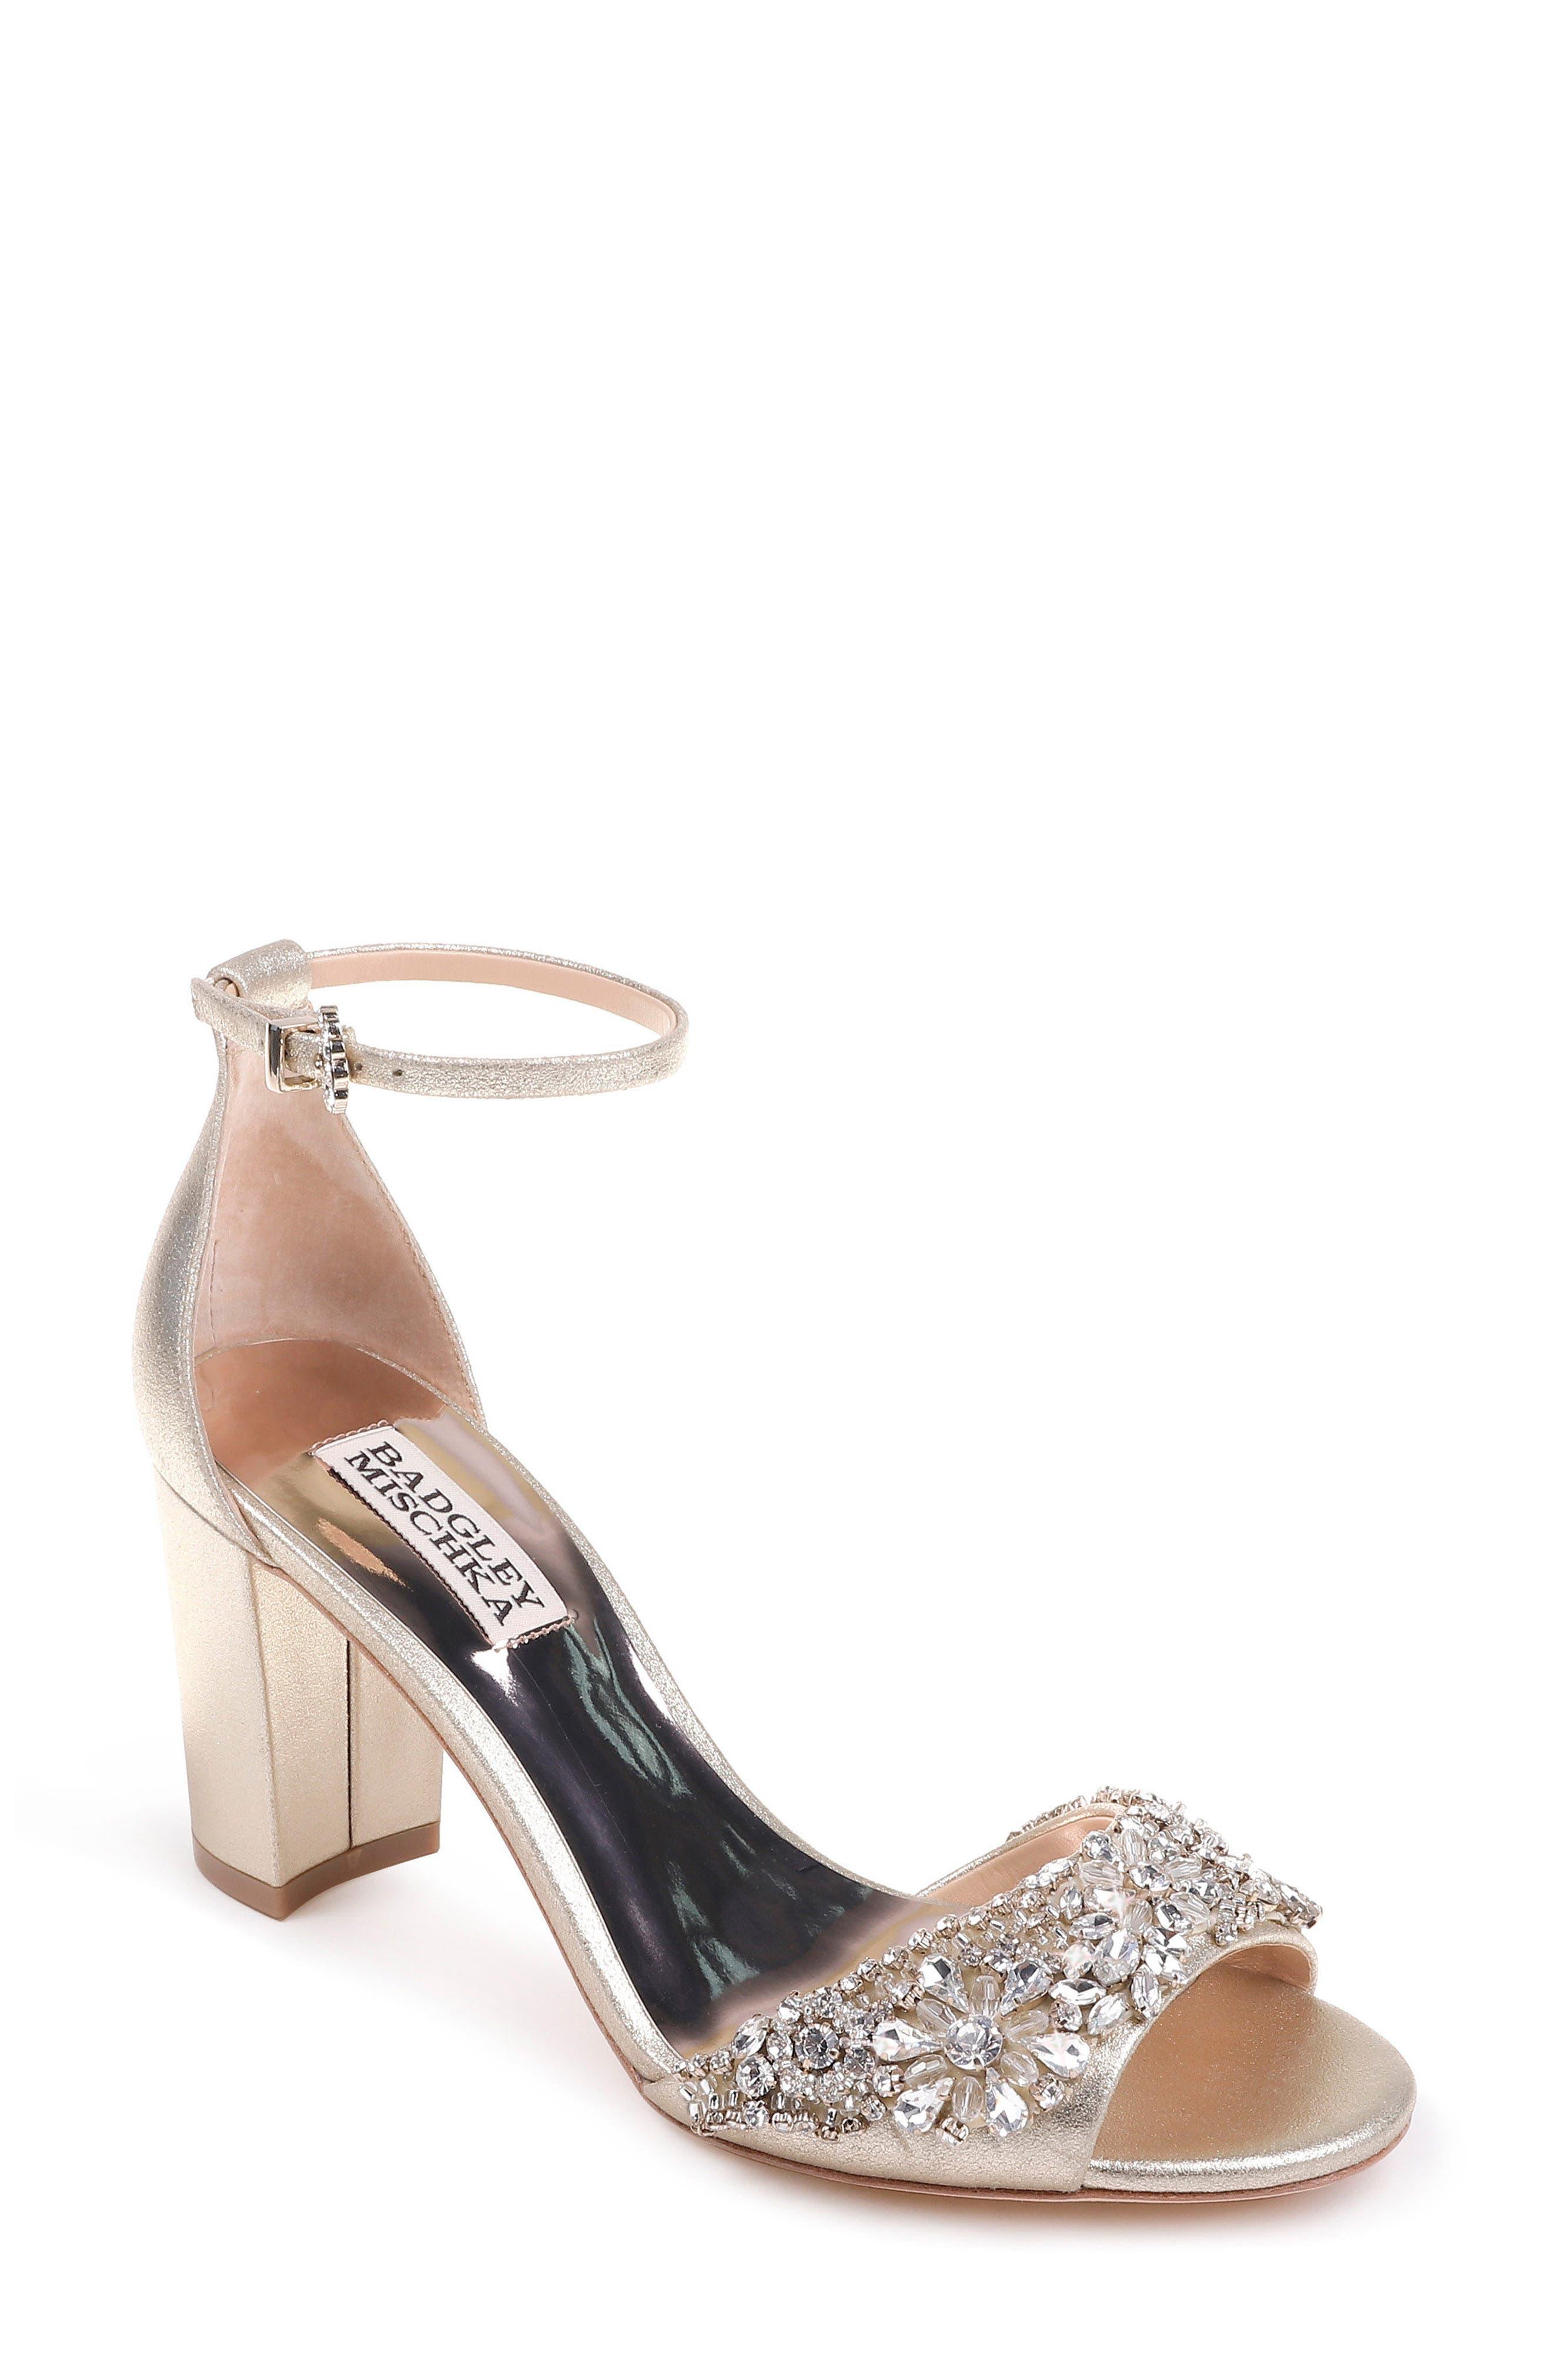 Hines Embellished Block Heel Sandal,                             Main thumbnail 1, color,                             040